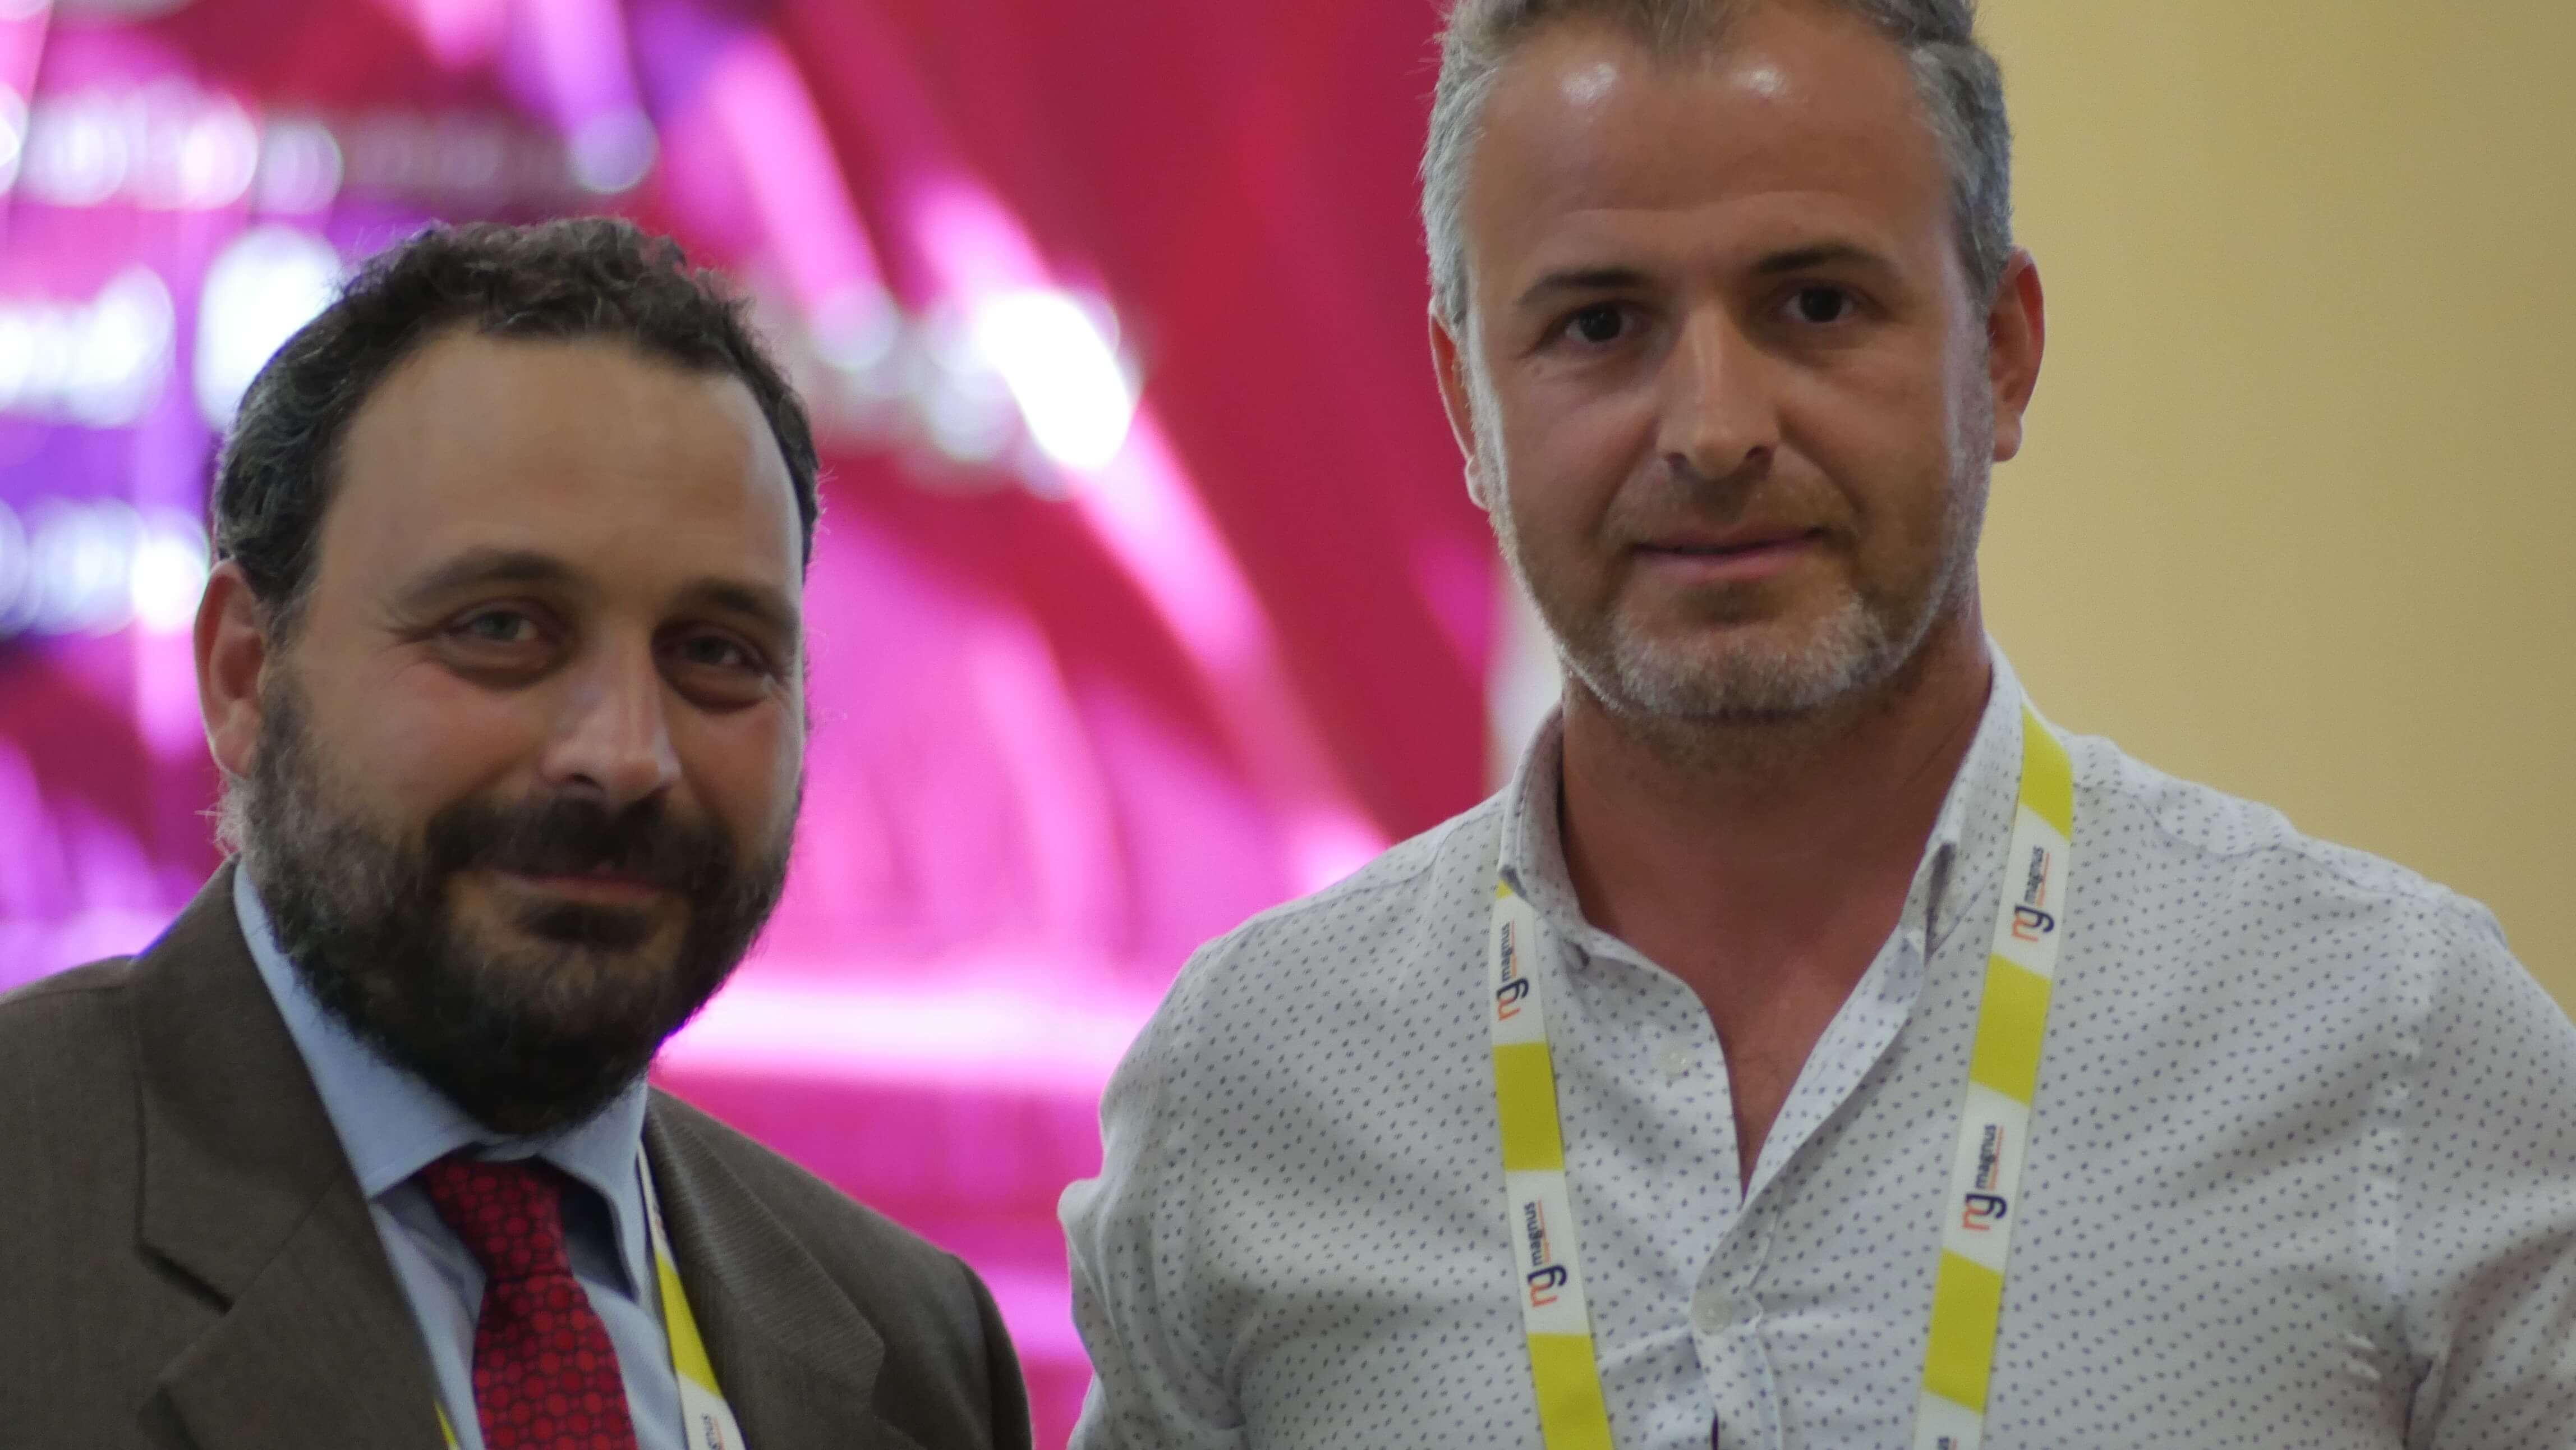 Cancer Conferences - Francesco Giovinazzo